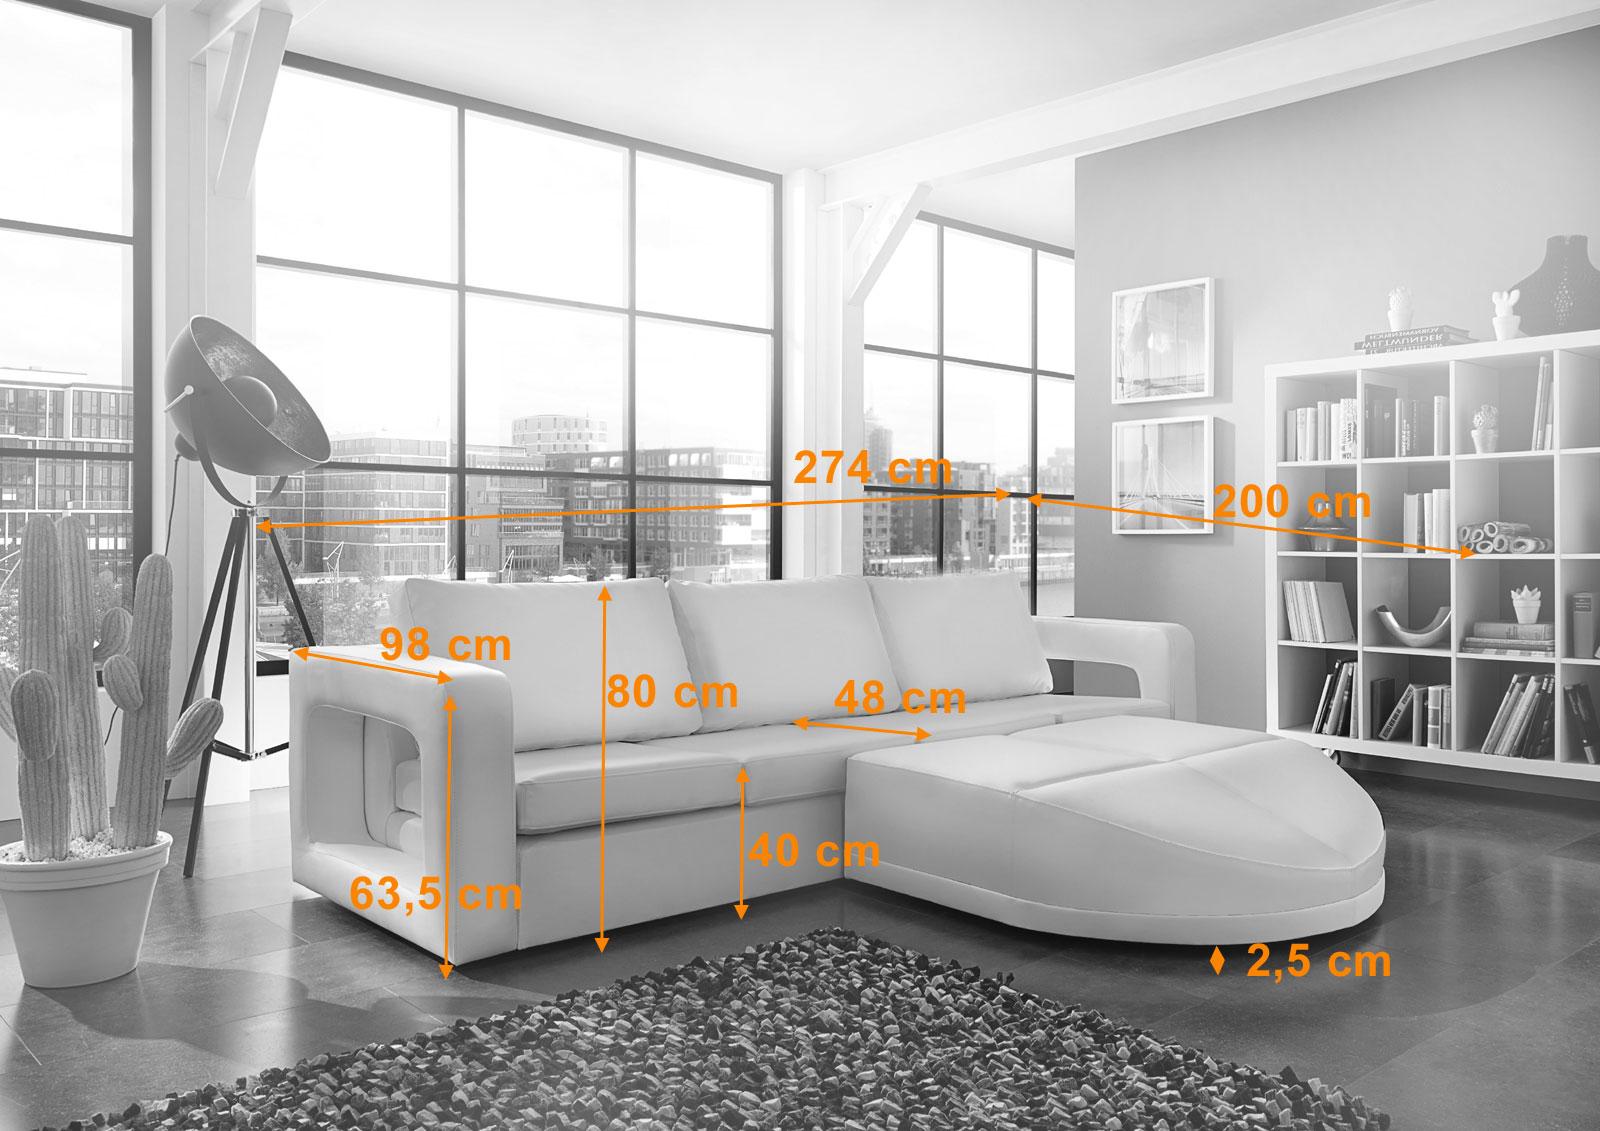 sam ecksofa schwarz wei sofa doccia 274 x 200 cm auf lager. Black Bedroom Furniture Sets. Home Design Ideas